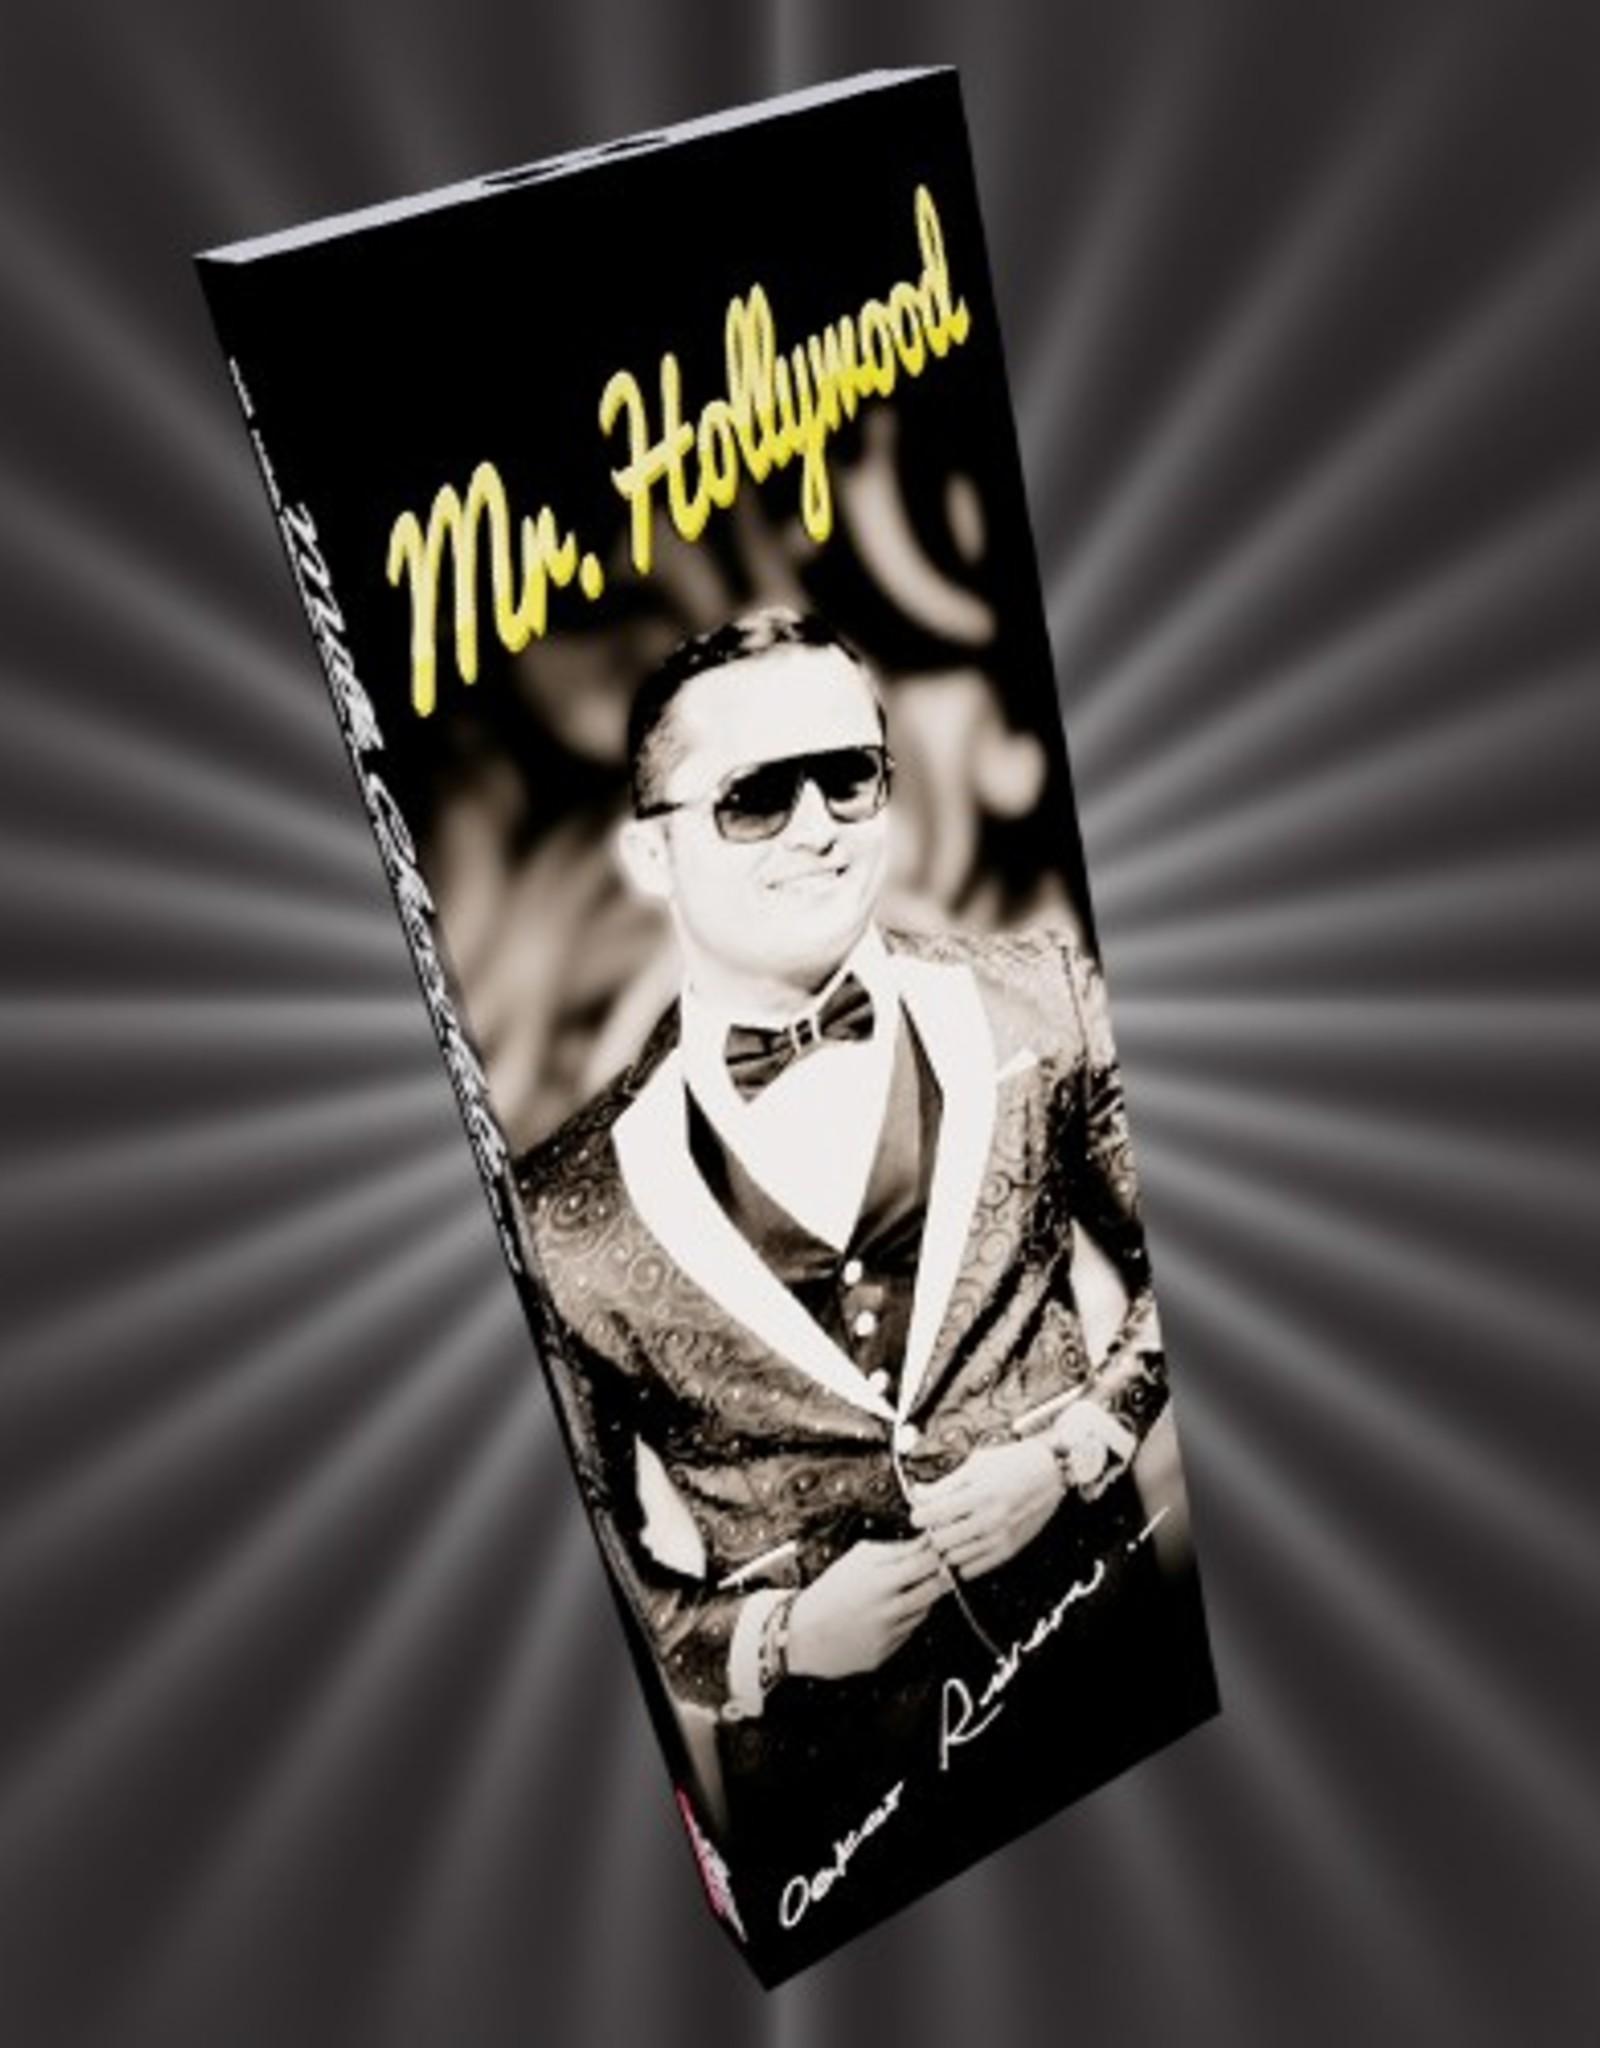 Mr Hollywood Chocolate Bar